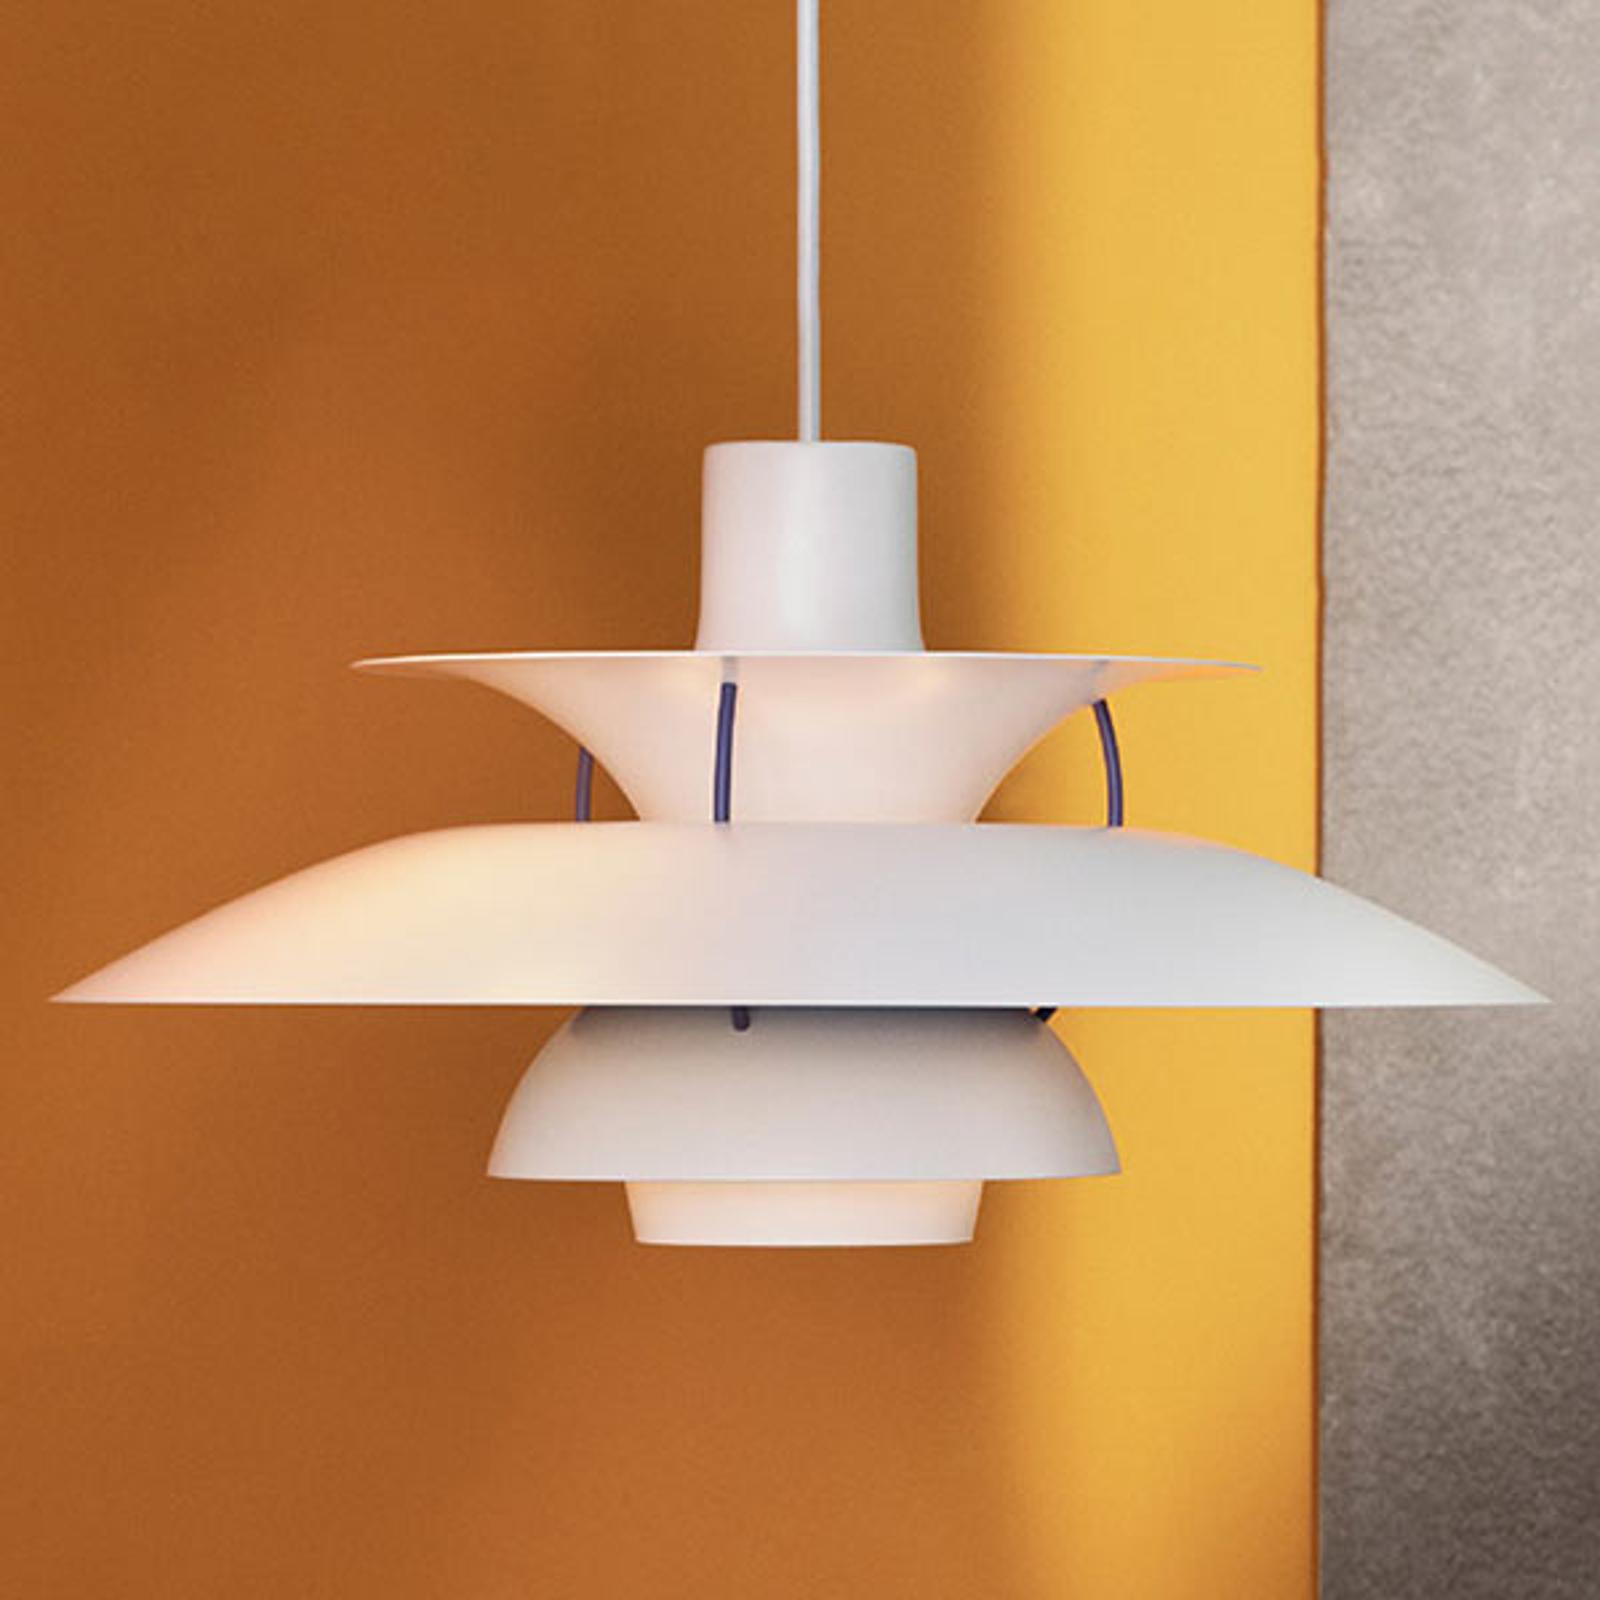 Hanglamp PH 5 classic mat wit